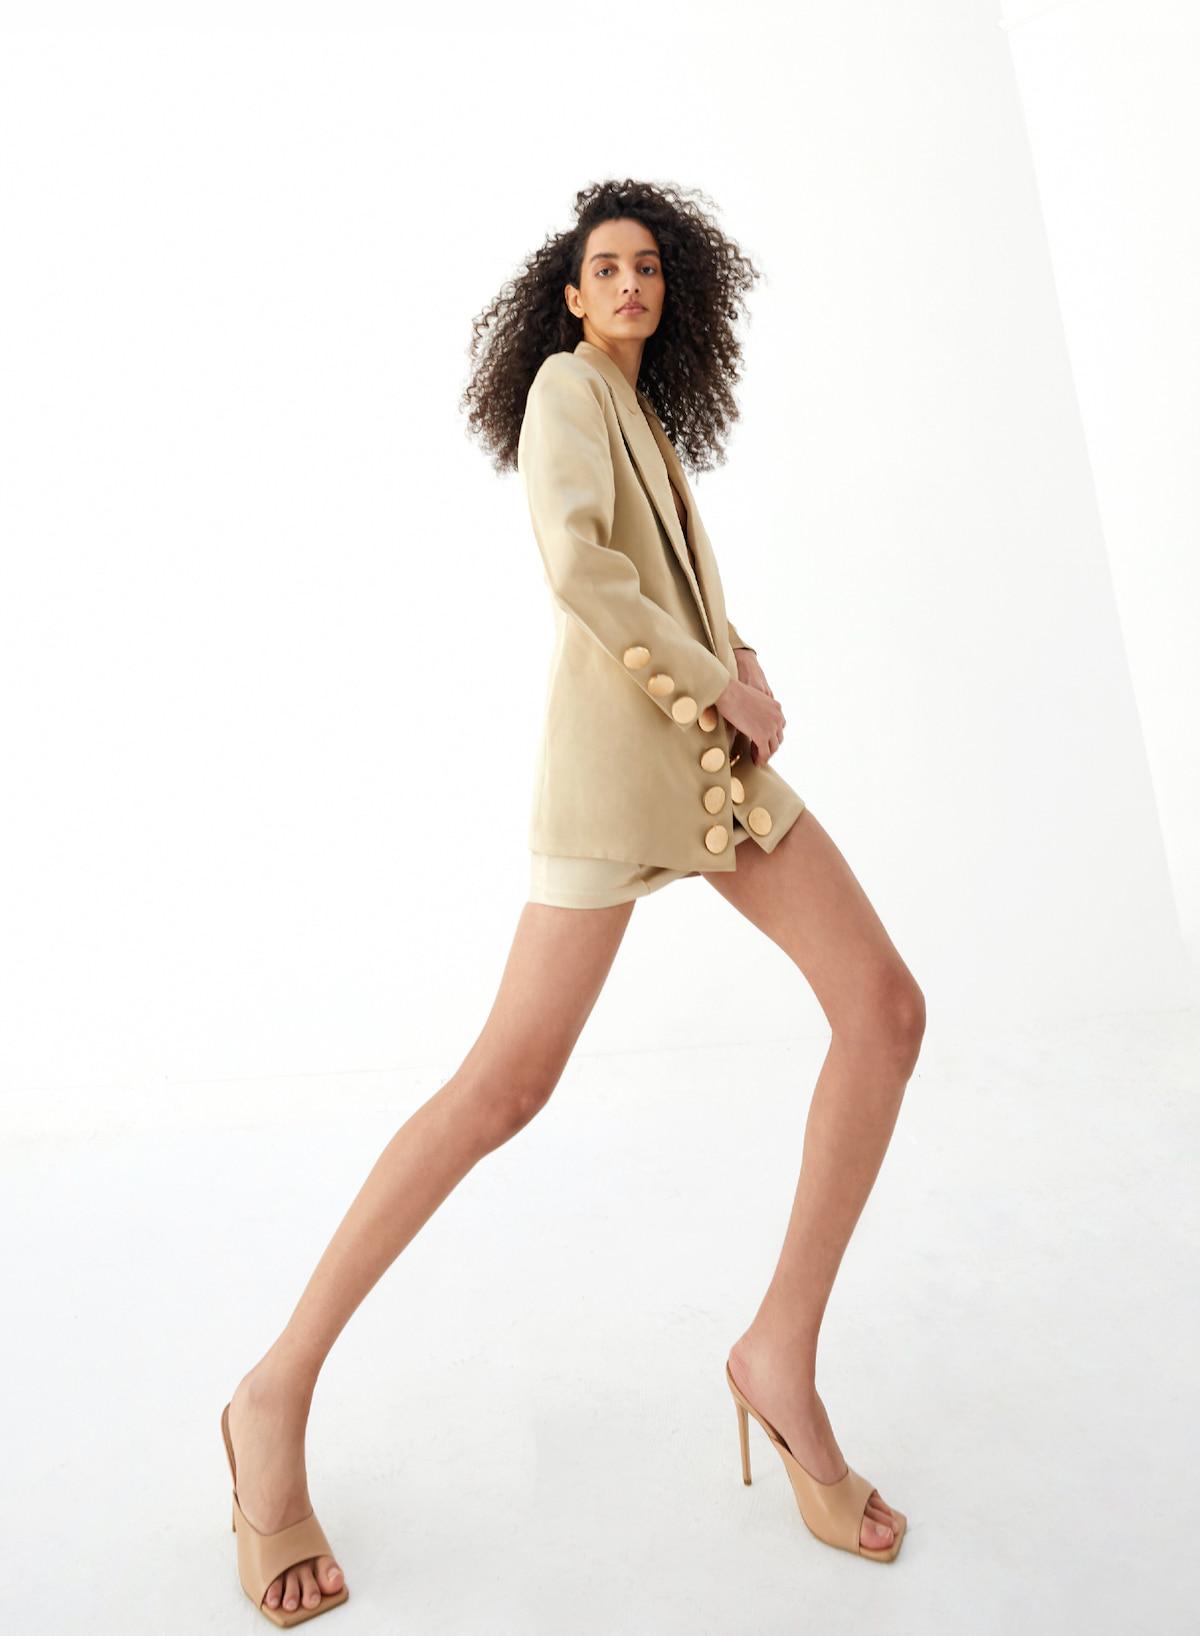 View 4 of model wearing Kalisa Blazer in sand gold.